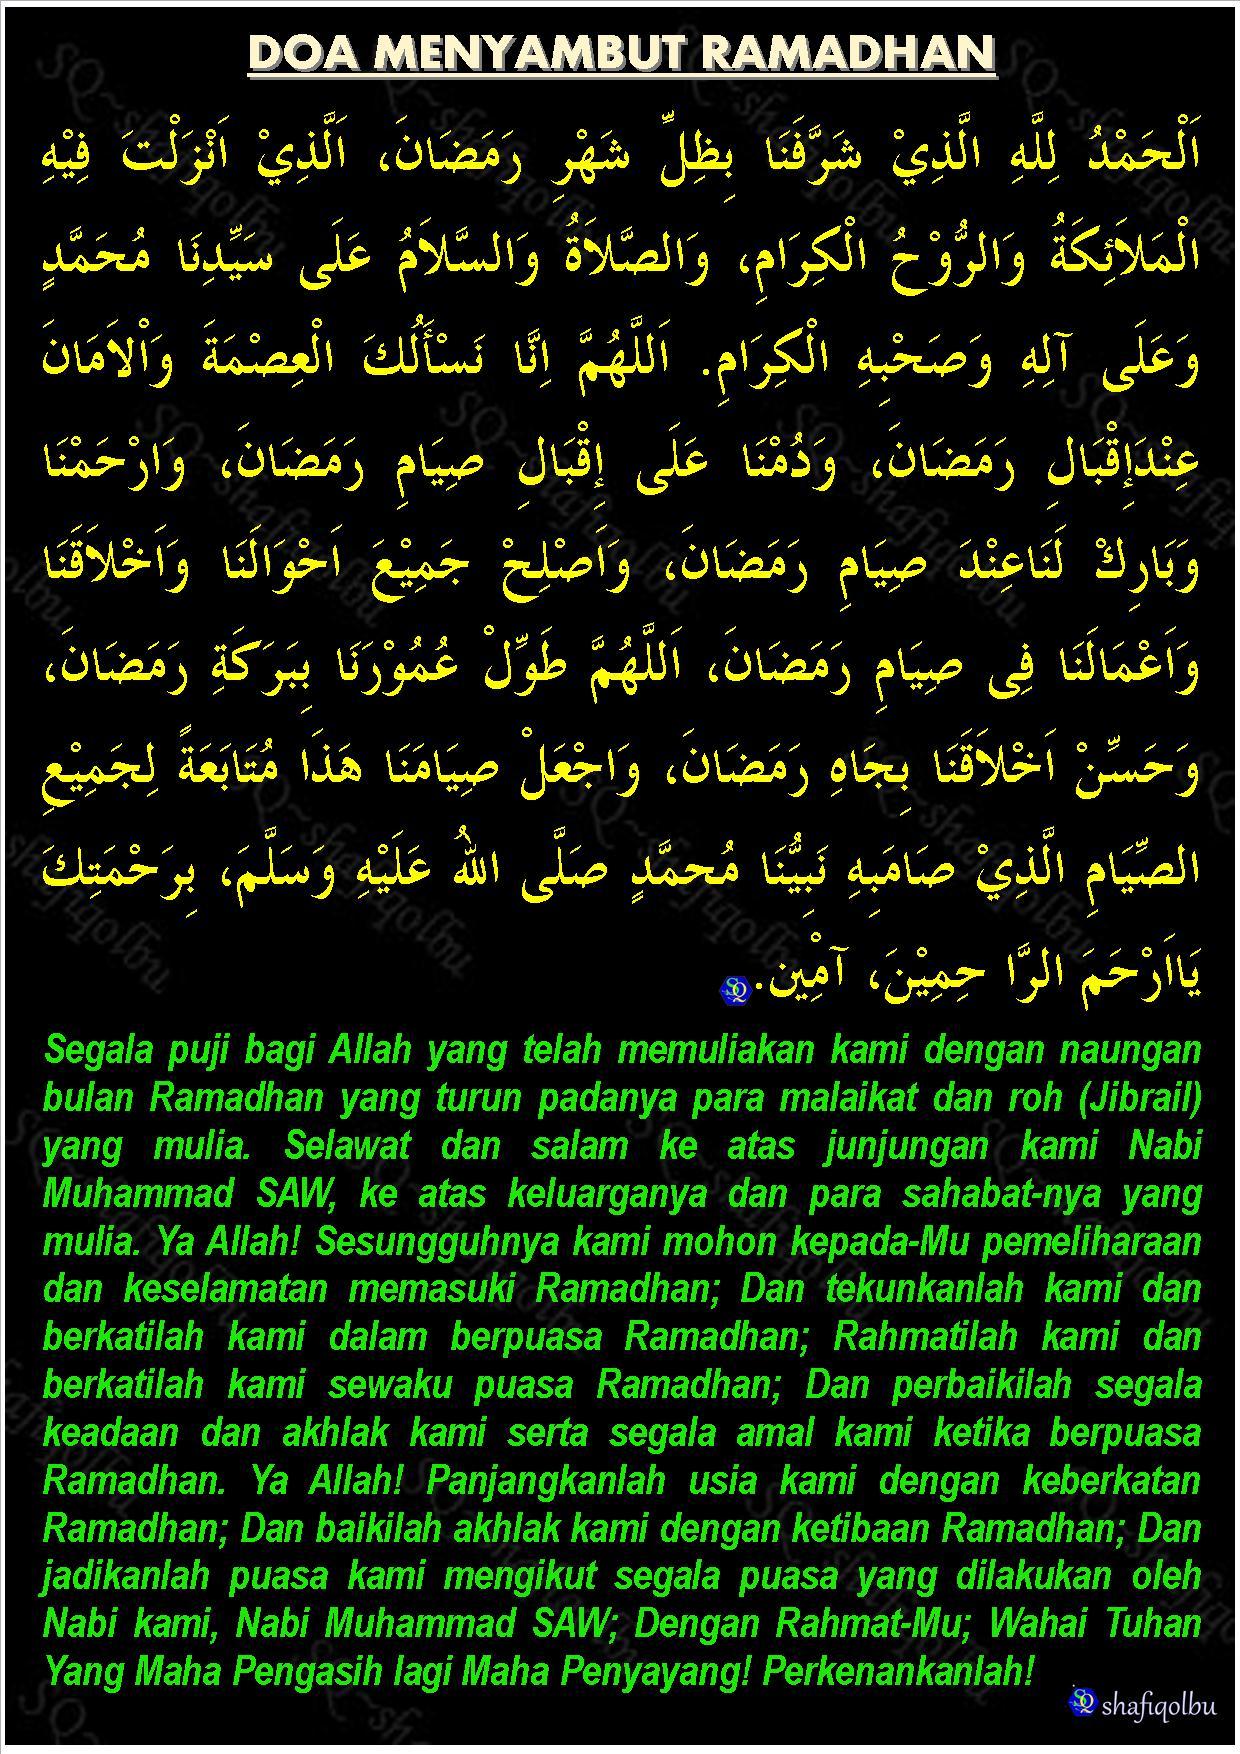 Doa Menyambut Bulan Ramadhan | Shafiqolbu